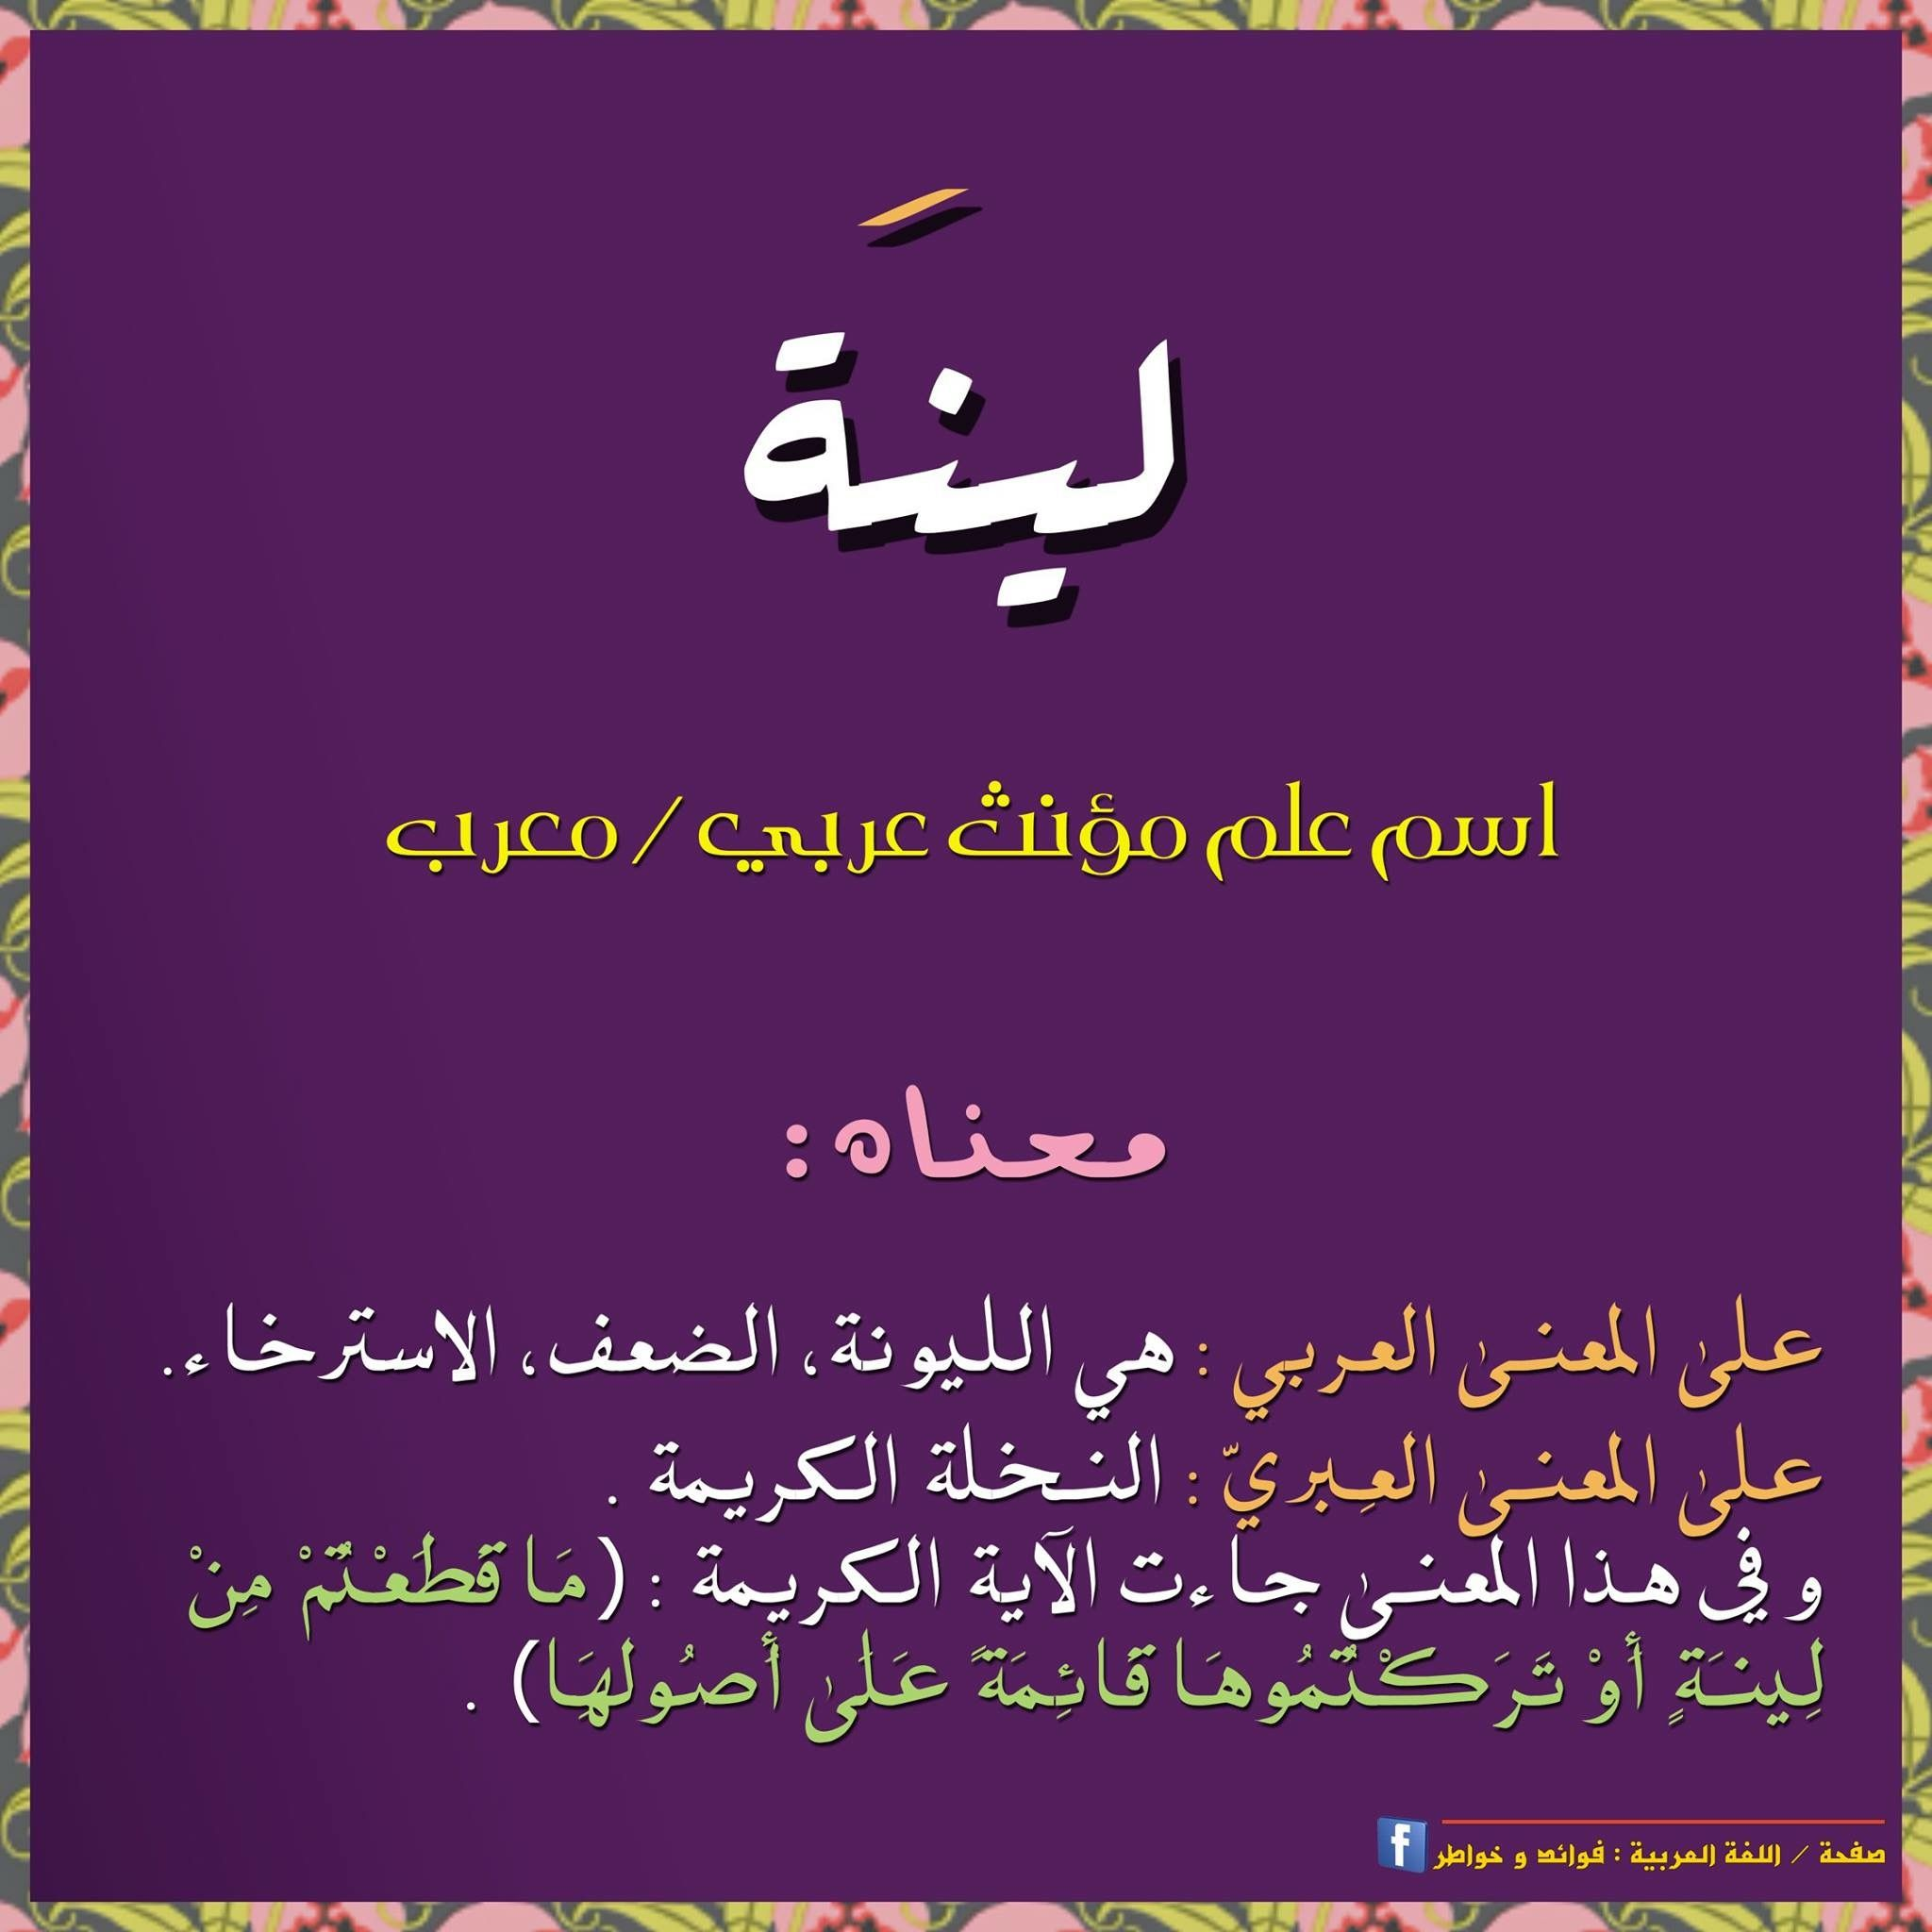 Pin By Khaled Bahnasawy On منوعة عربية Lix Arabic Calligraphy Calligraphy